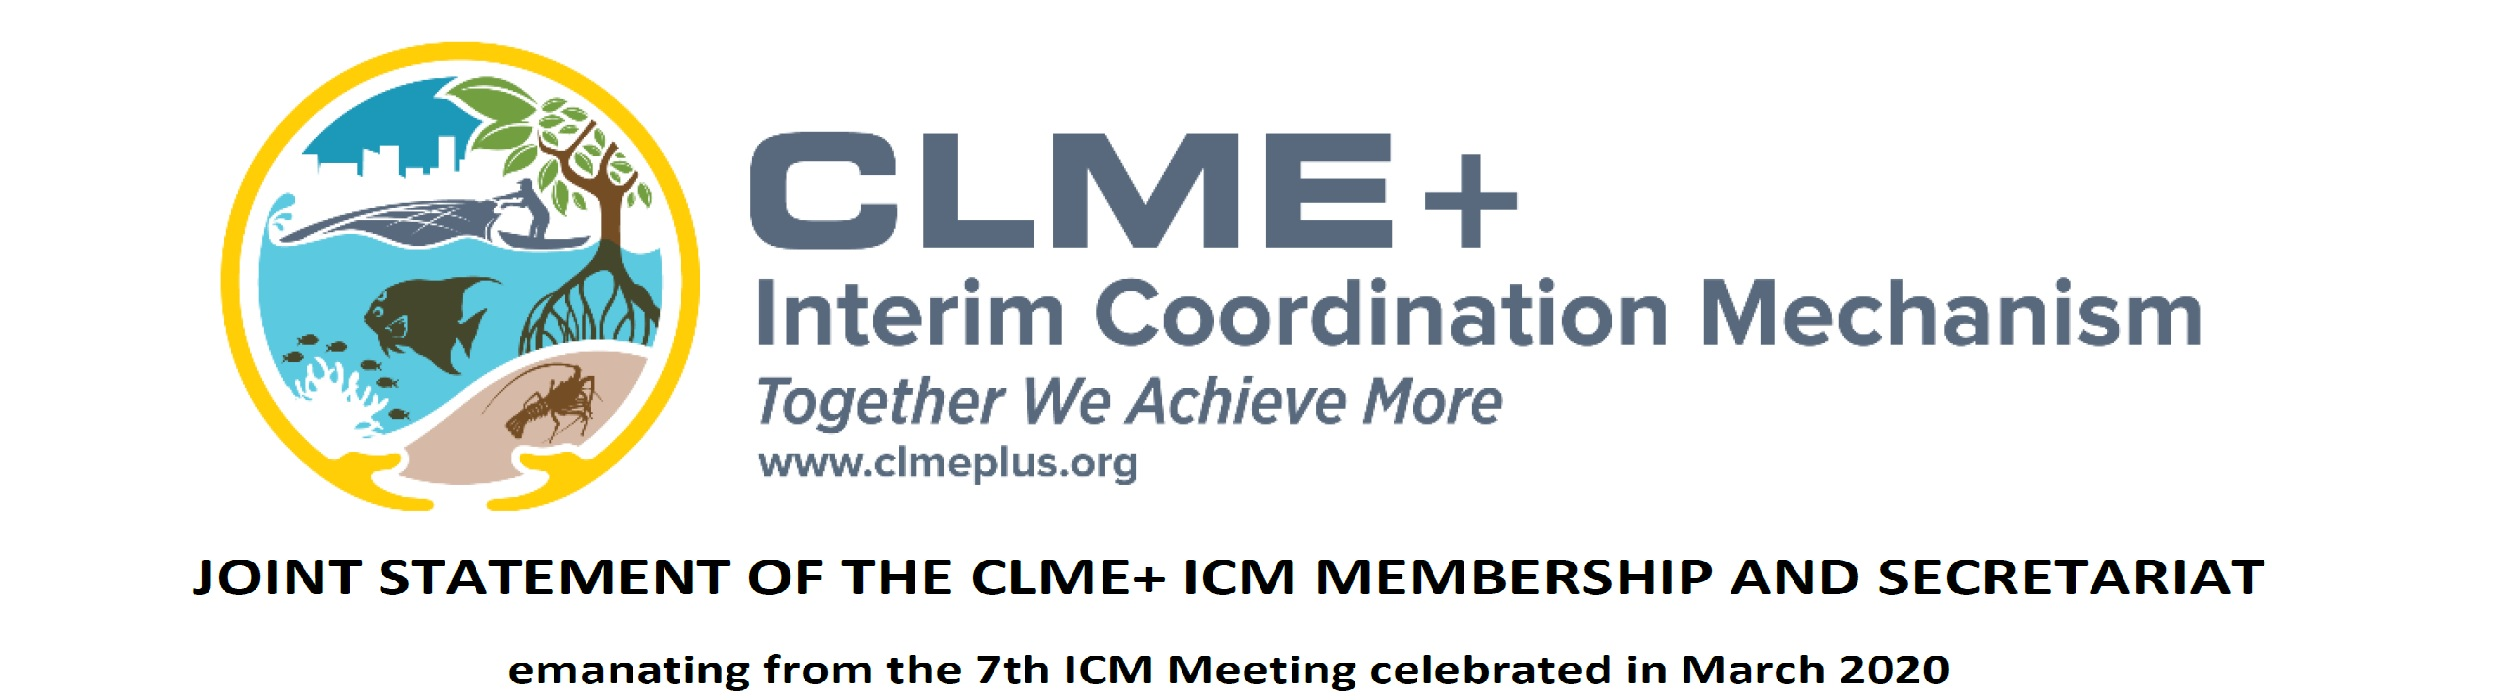 2020_03_CLME+ ICM Joint Statemenrt